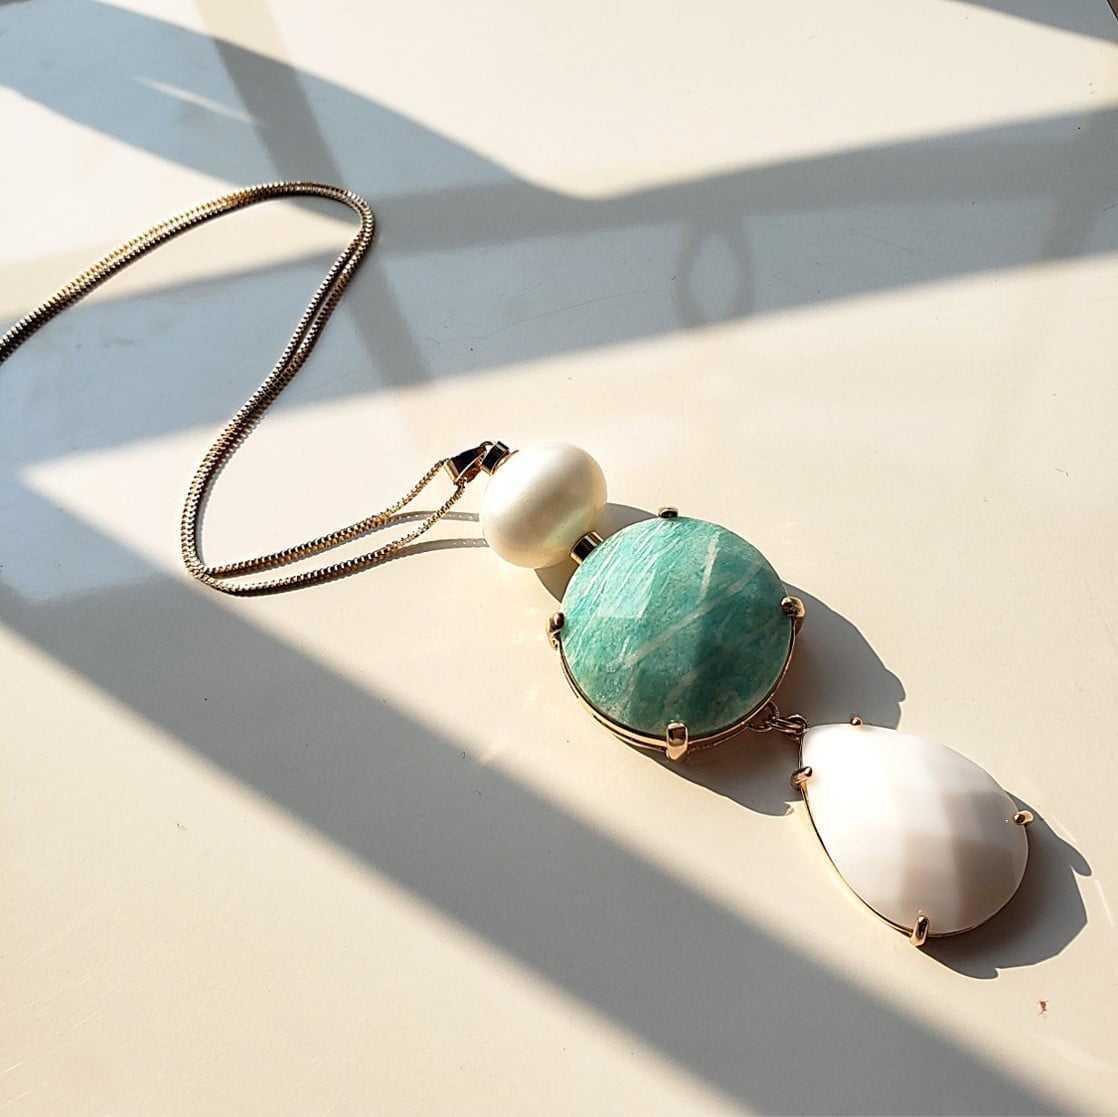 1-Colar longo com pingente de pérola shell, amazonita e cristal branco leitoso